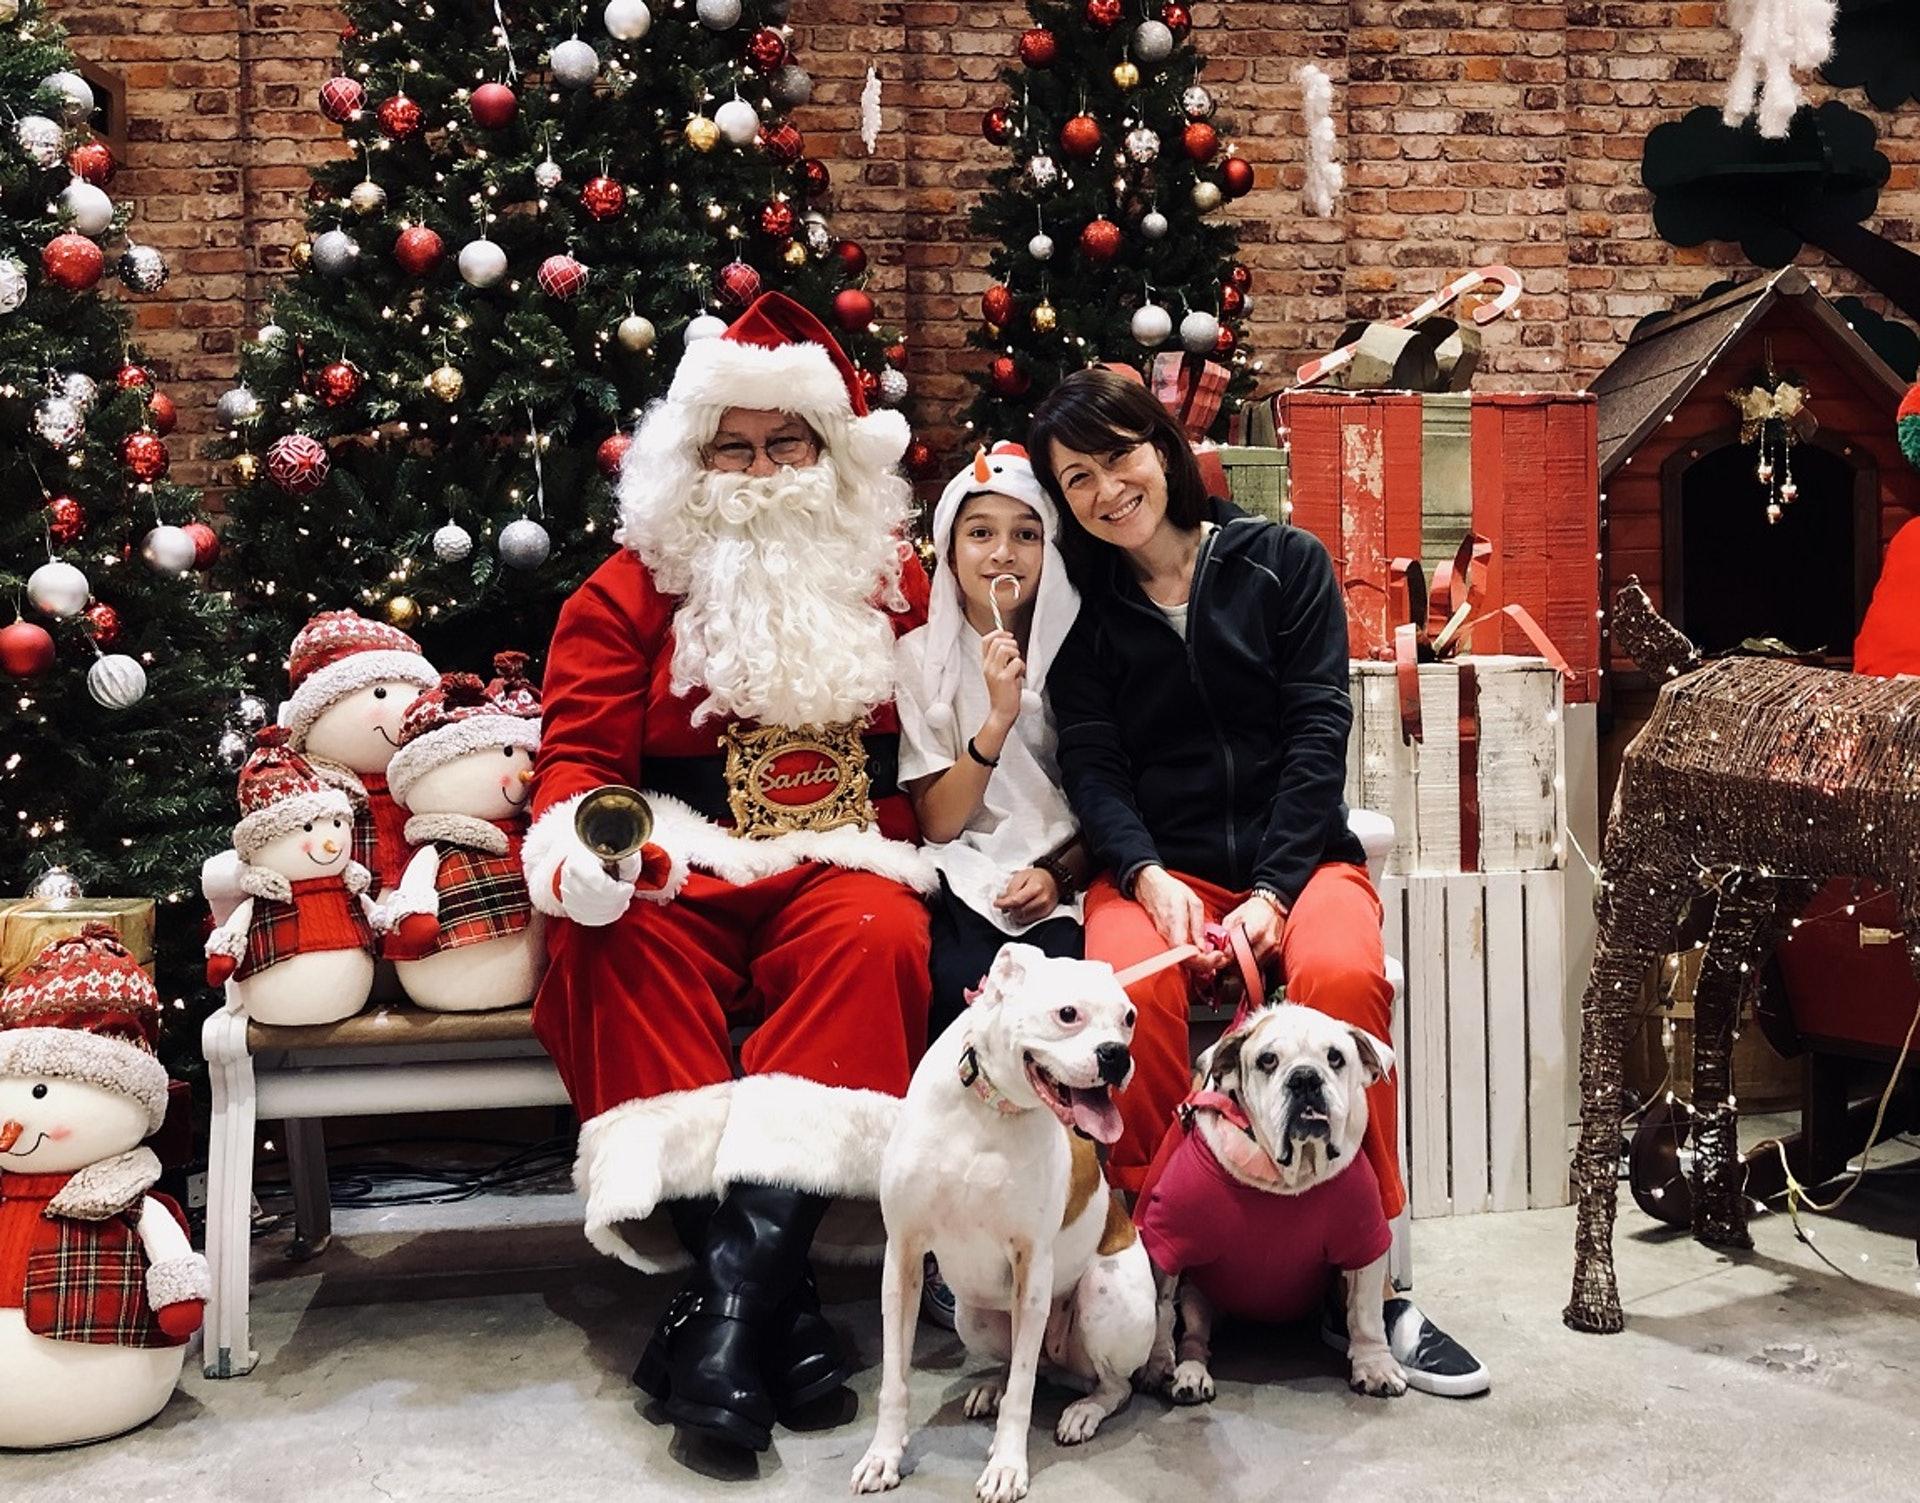 Jolene與家人一起迎接聖誕佳節。(受訪者提供圖片)